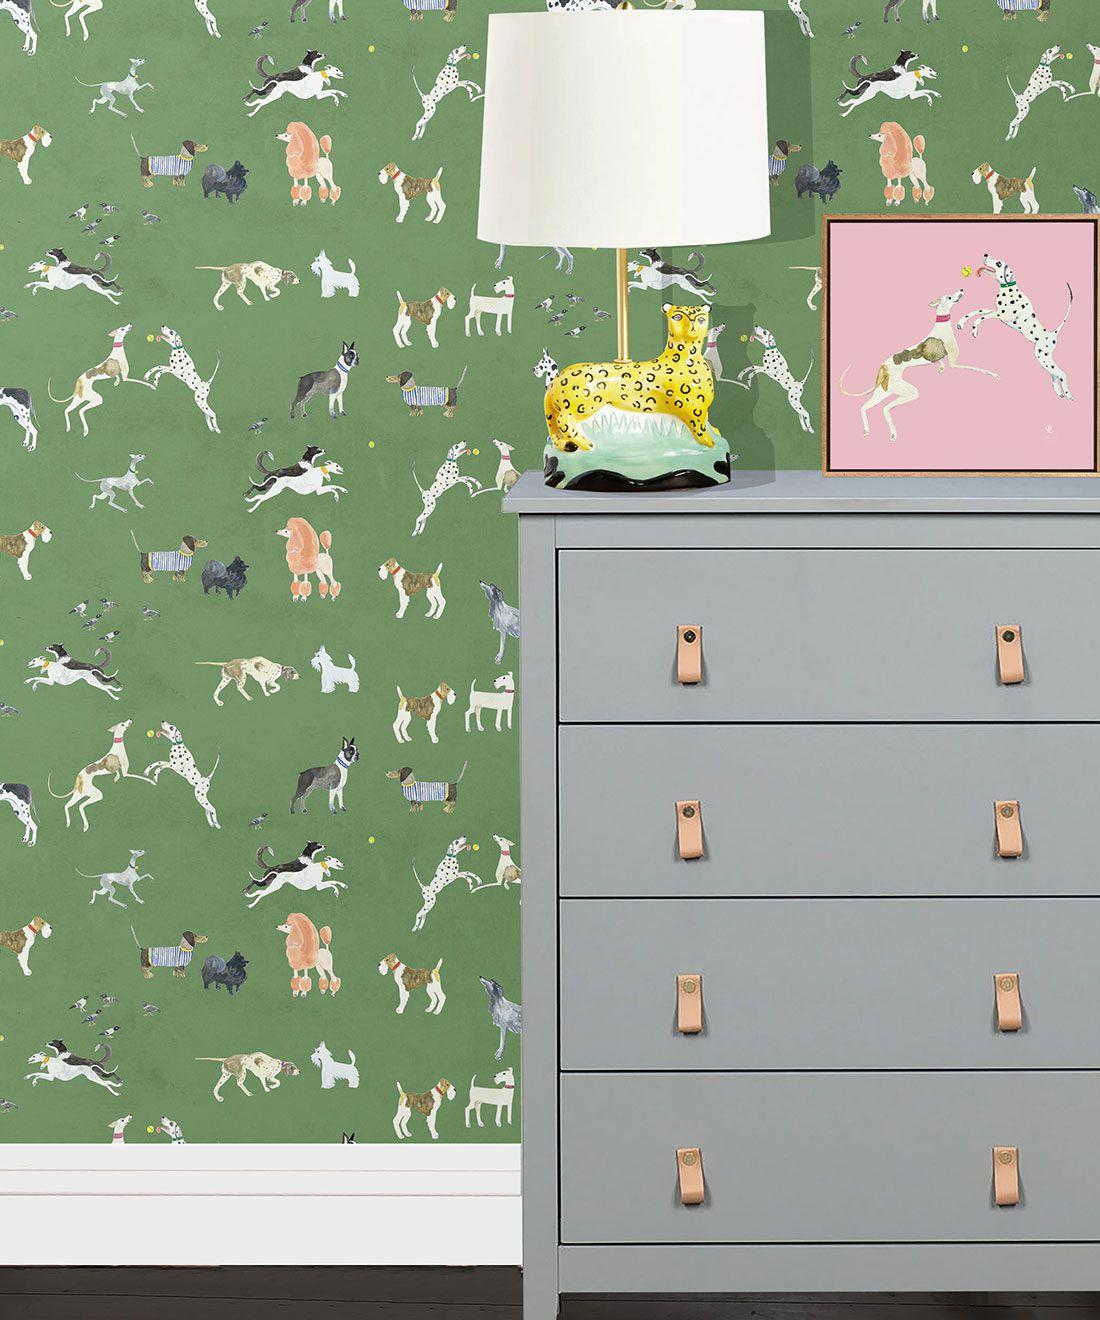 Doggies Wallpaper •Dog Wallpaper •Green • Insitu with lamp